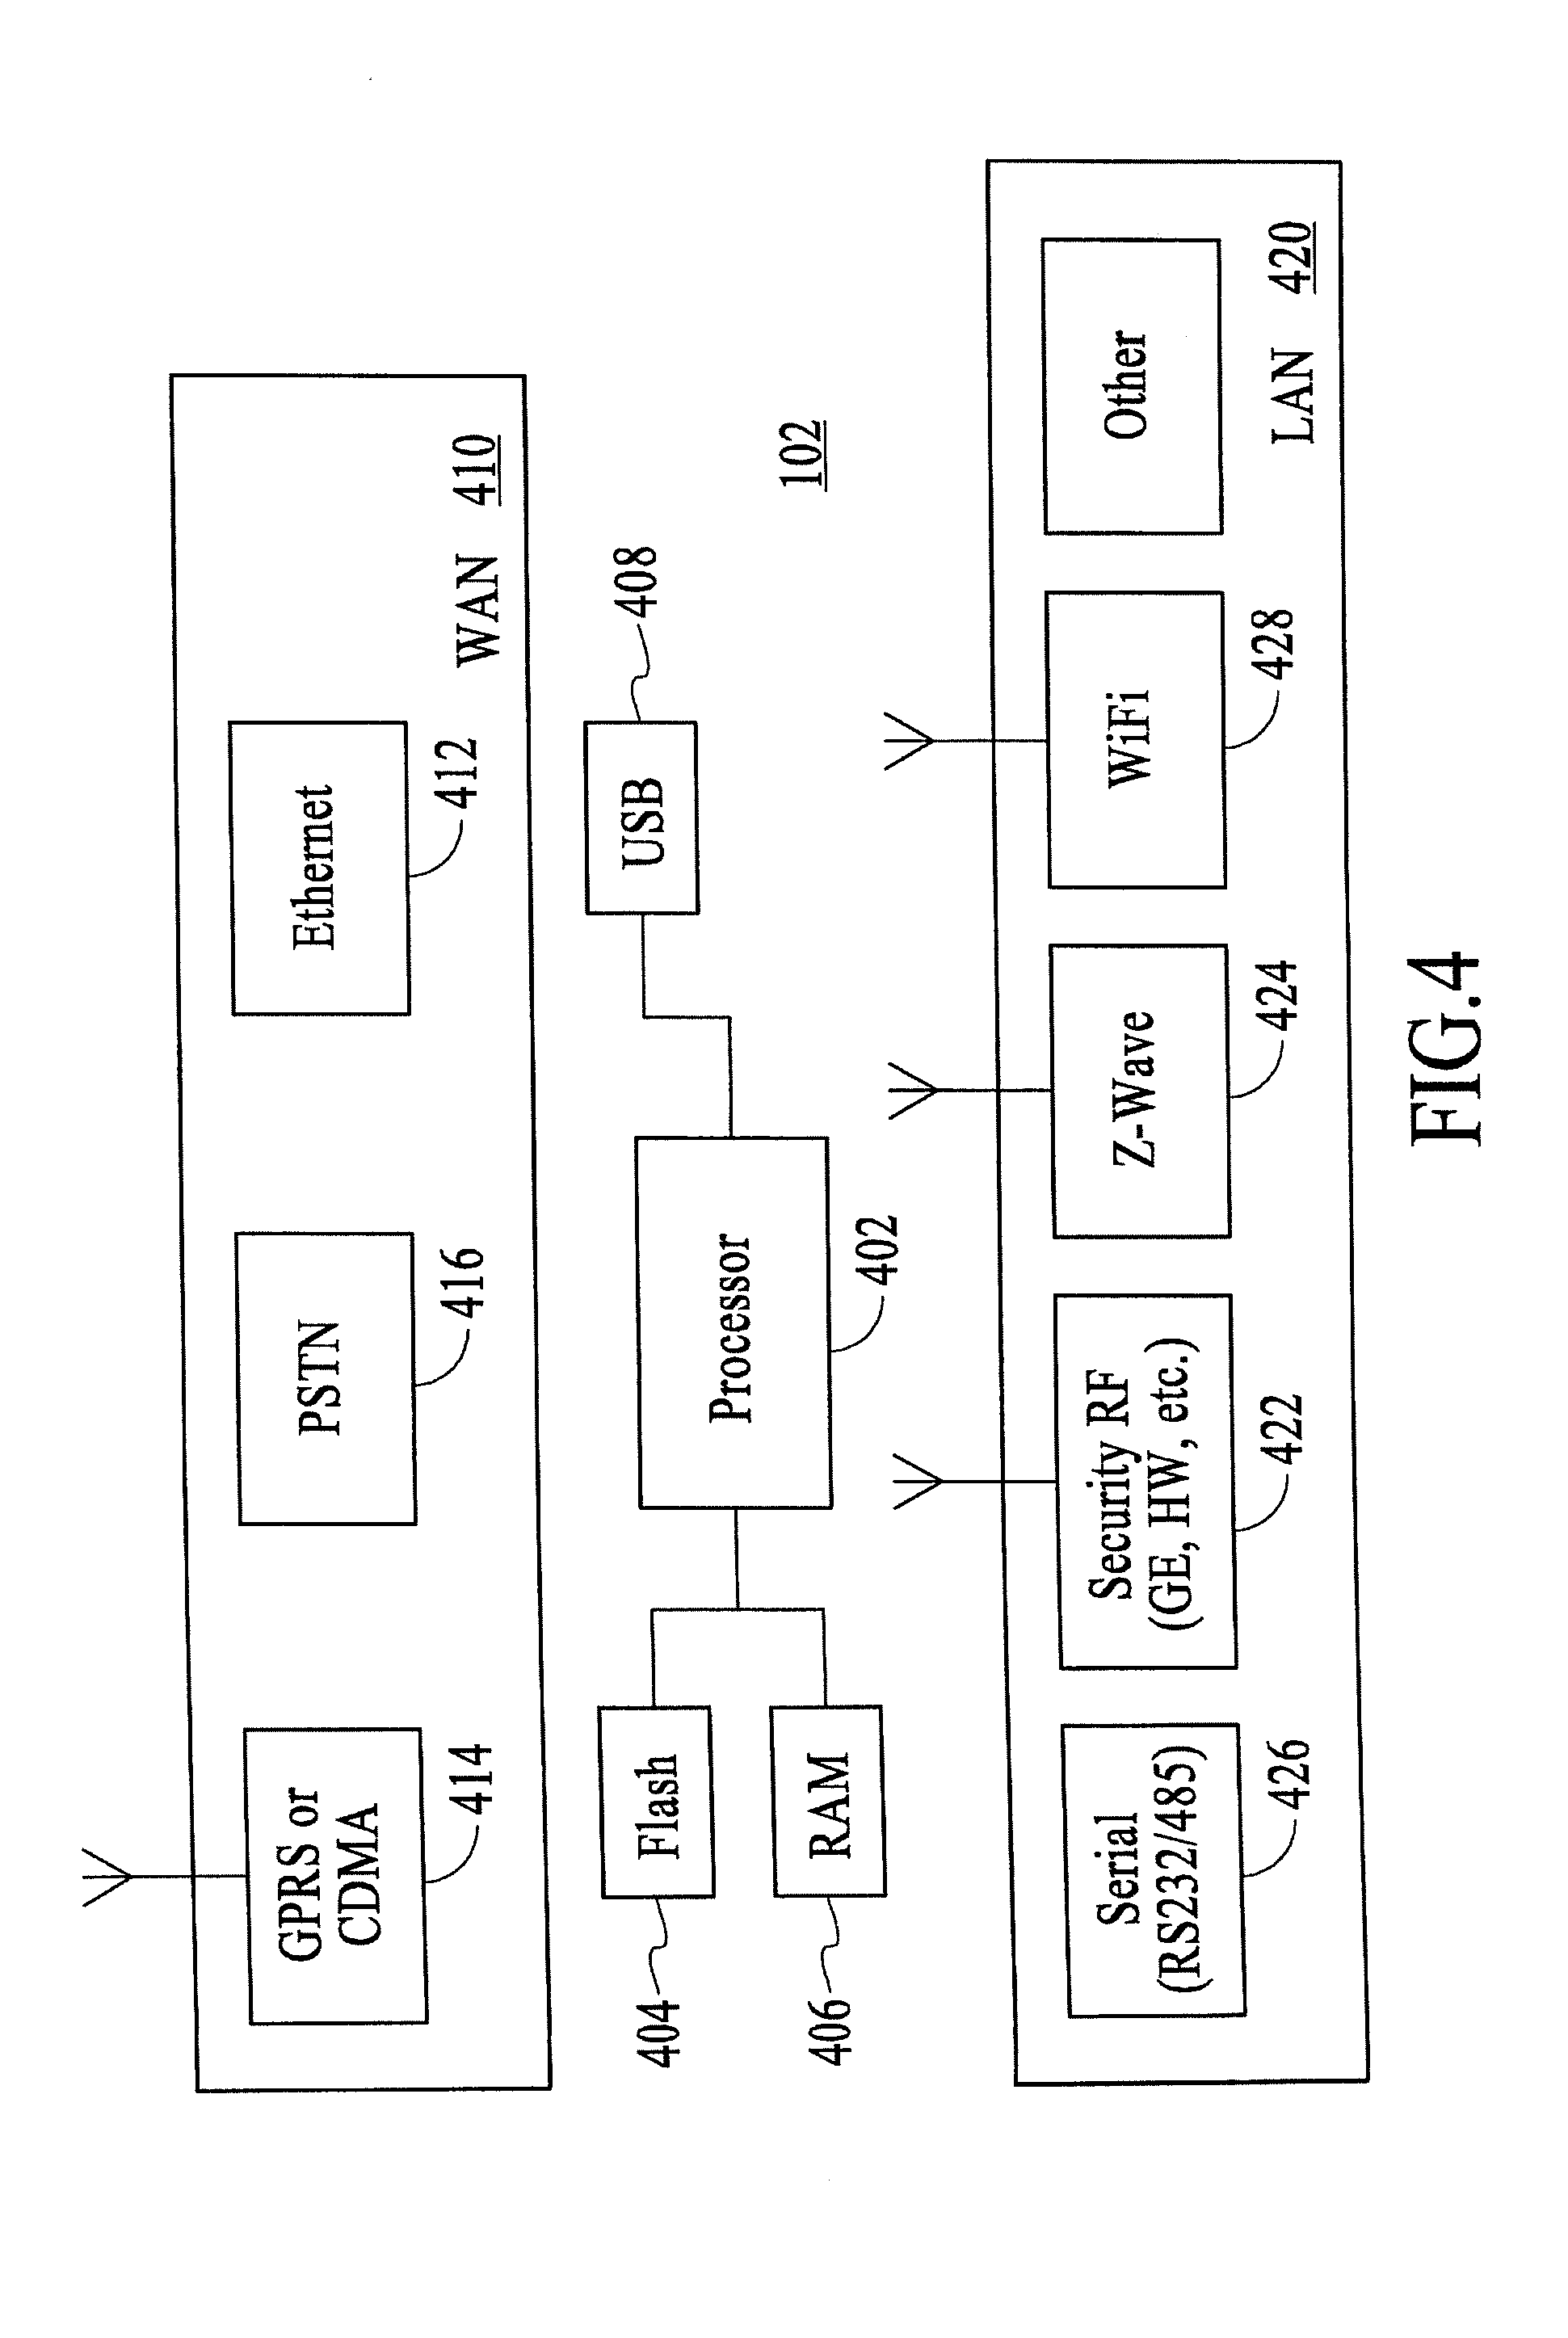 Patent US 10,142,394 B2